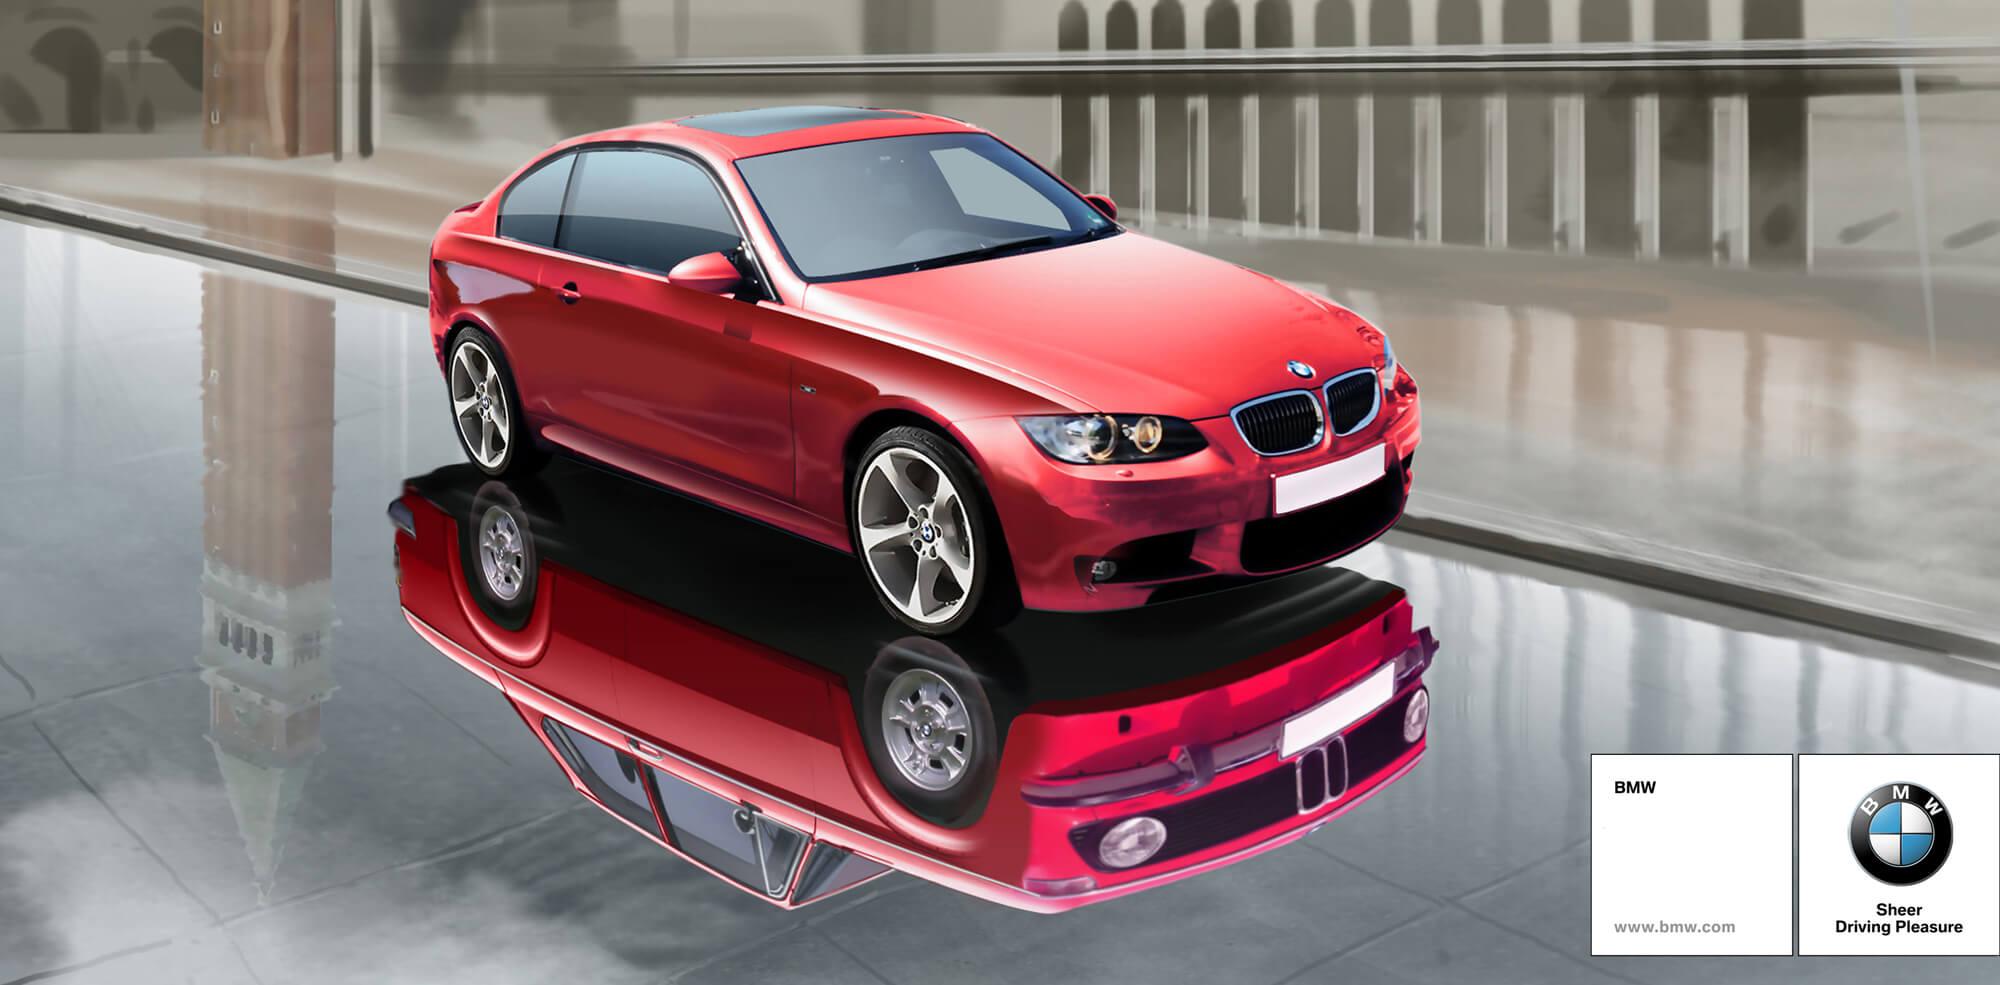 BMW_Print_Ads_3.jpg